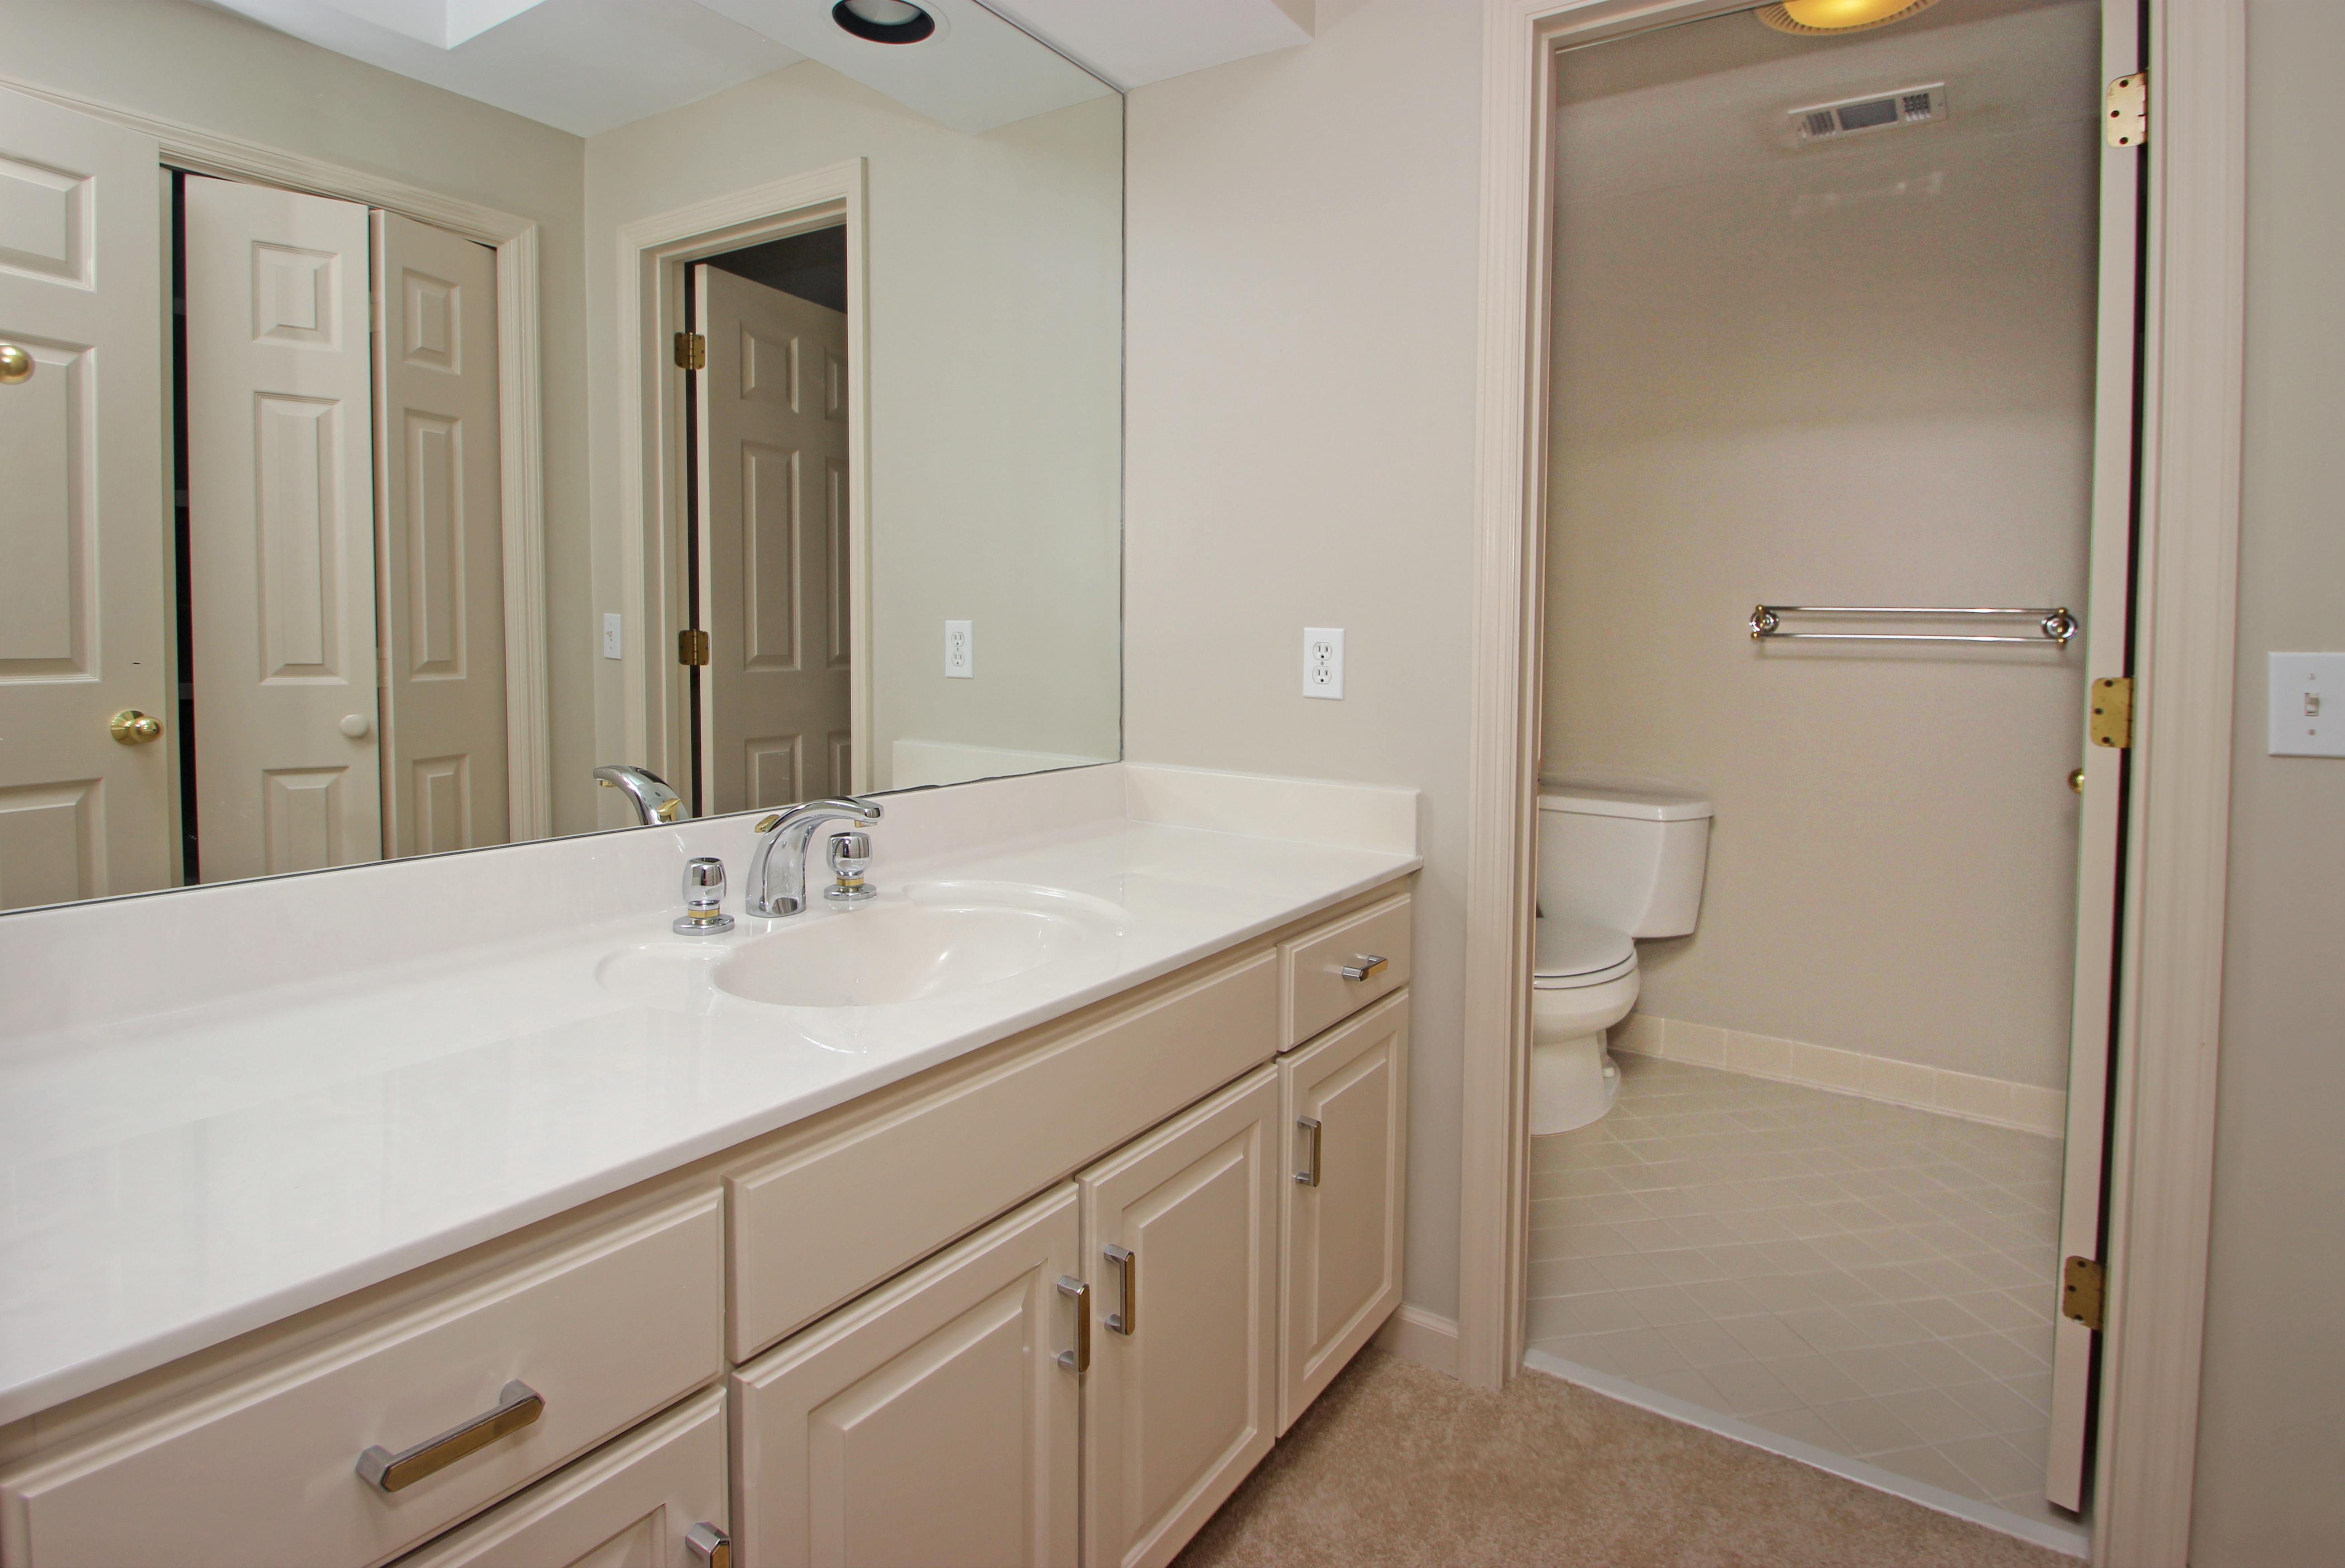 HI - Guest bath - 2nd level